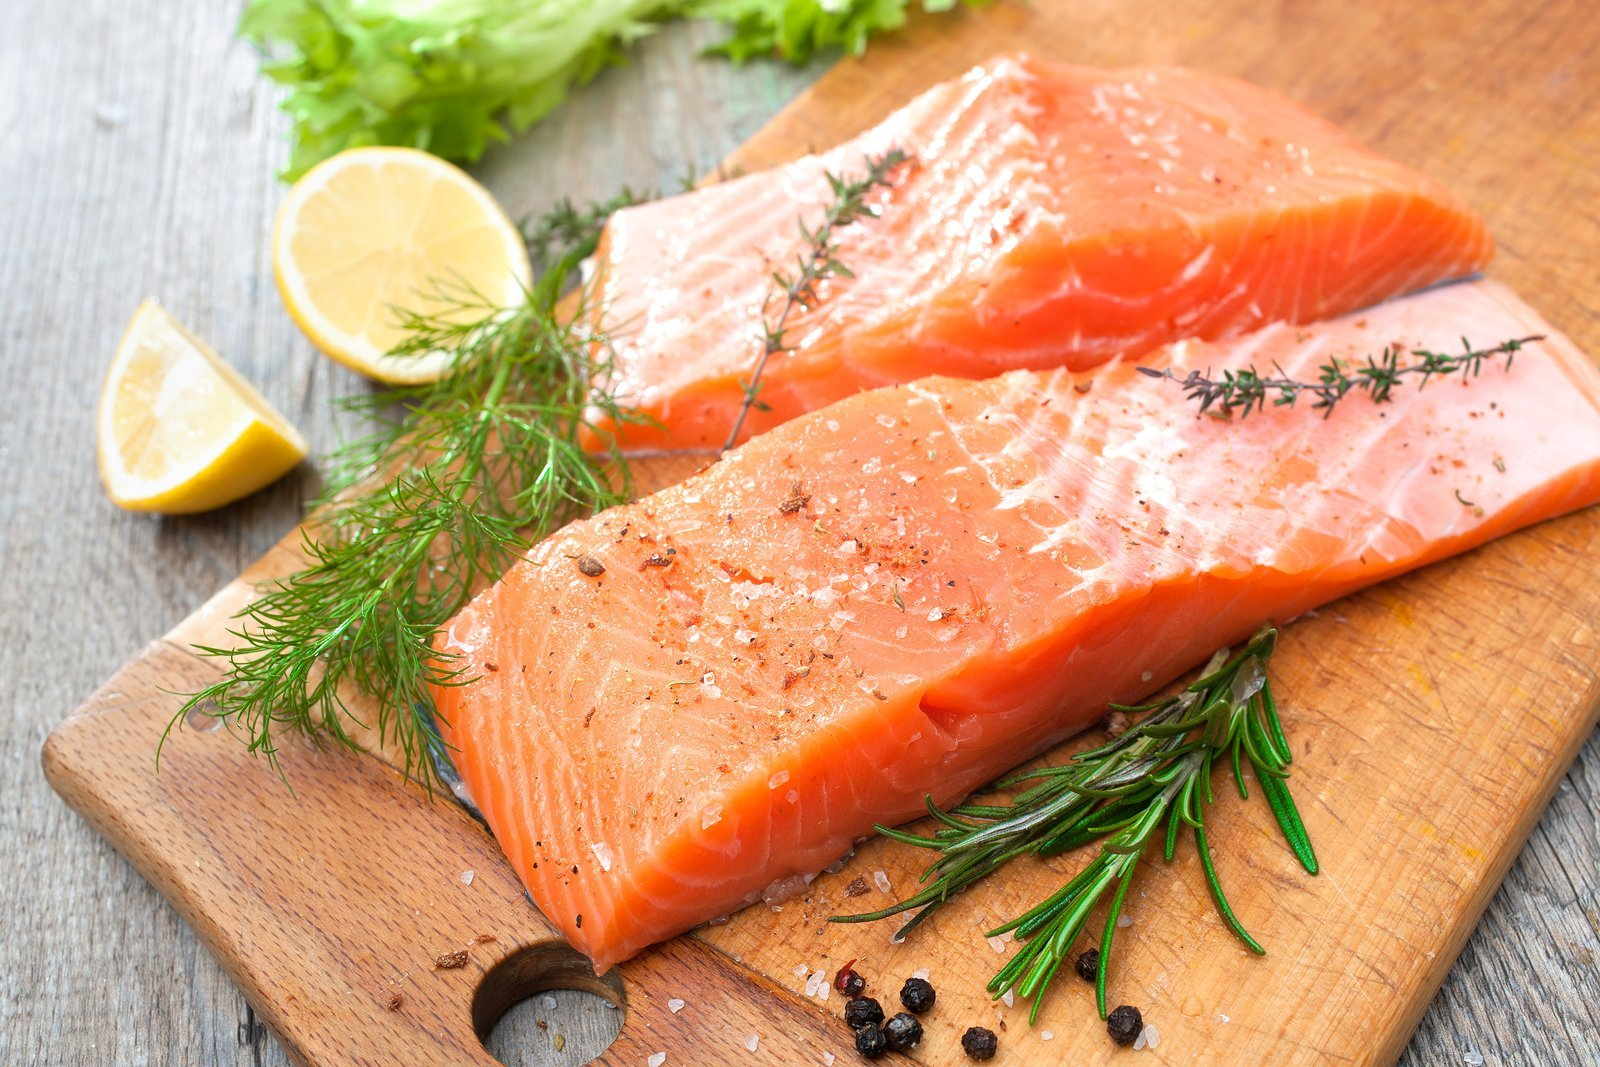 salmon, omega-3, healthy fat, nutritious, vitamin A